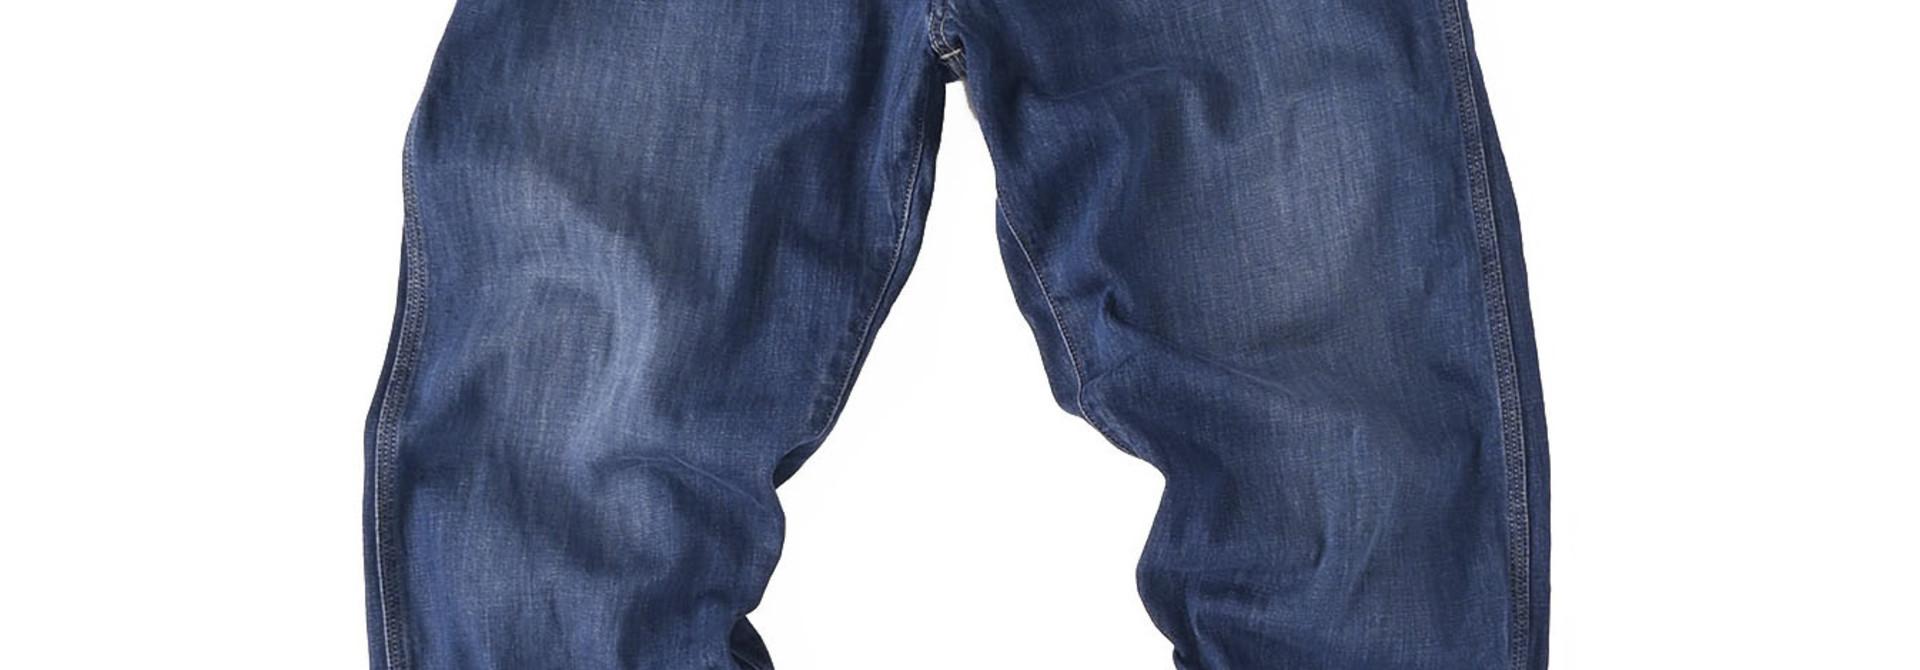 Indigo 908 Painter Pants Distressed (0721)